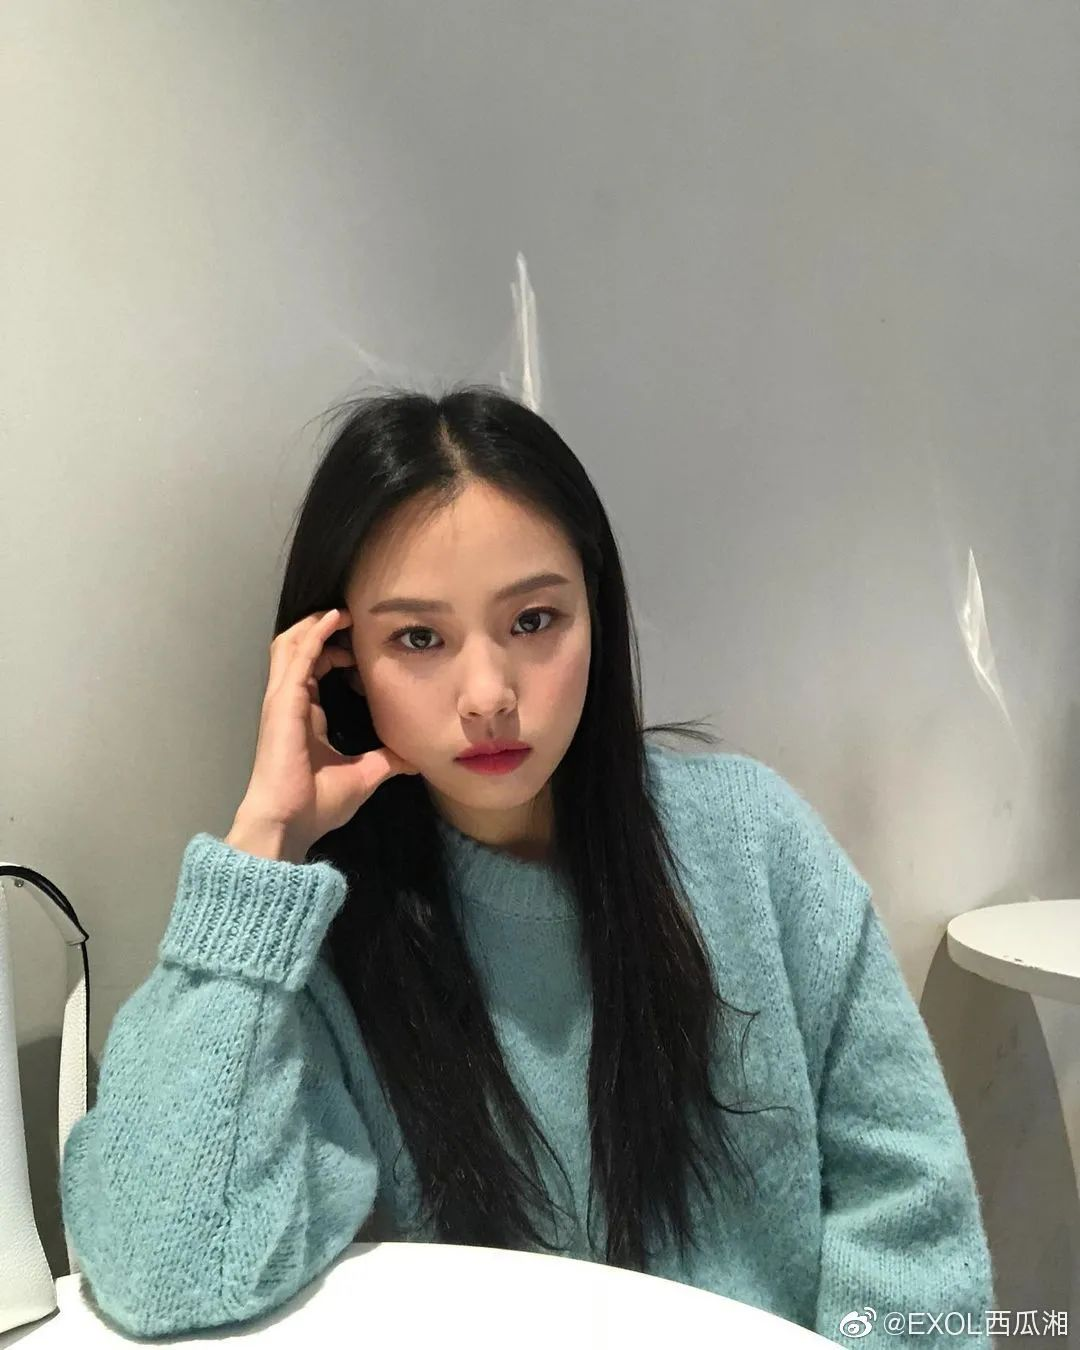 Face bump Kim min hee Korean drama atmosphere beauty + 1插图35